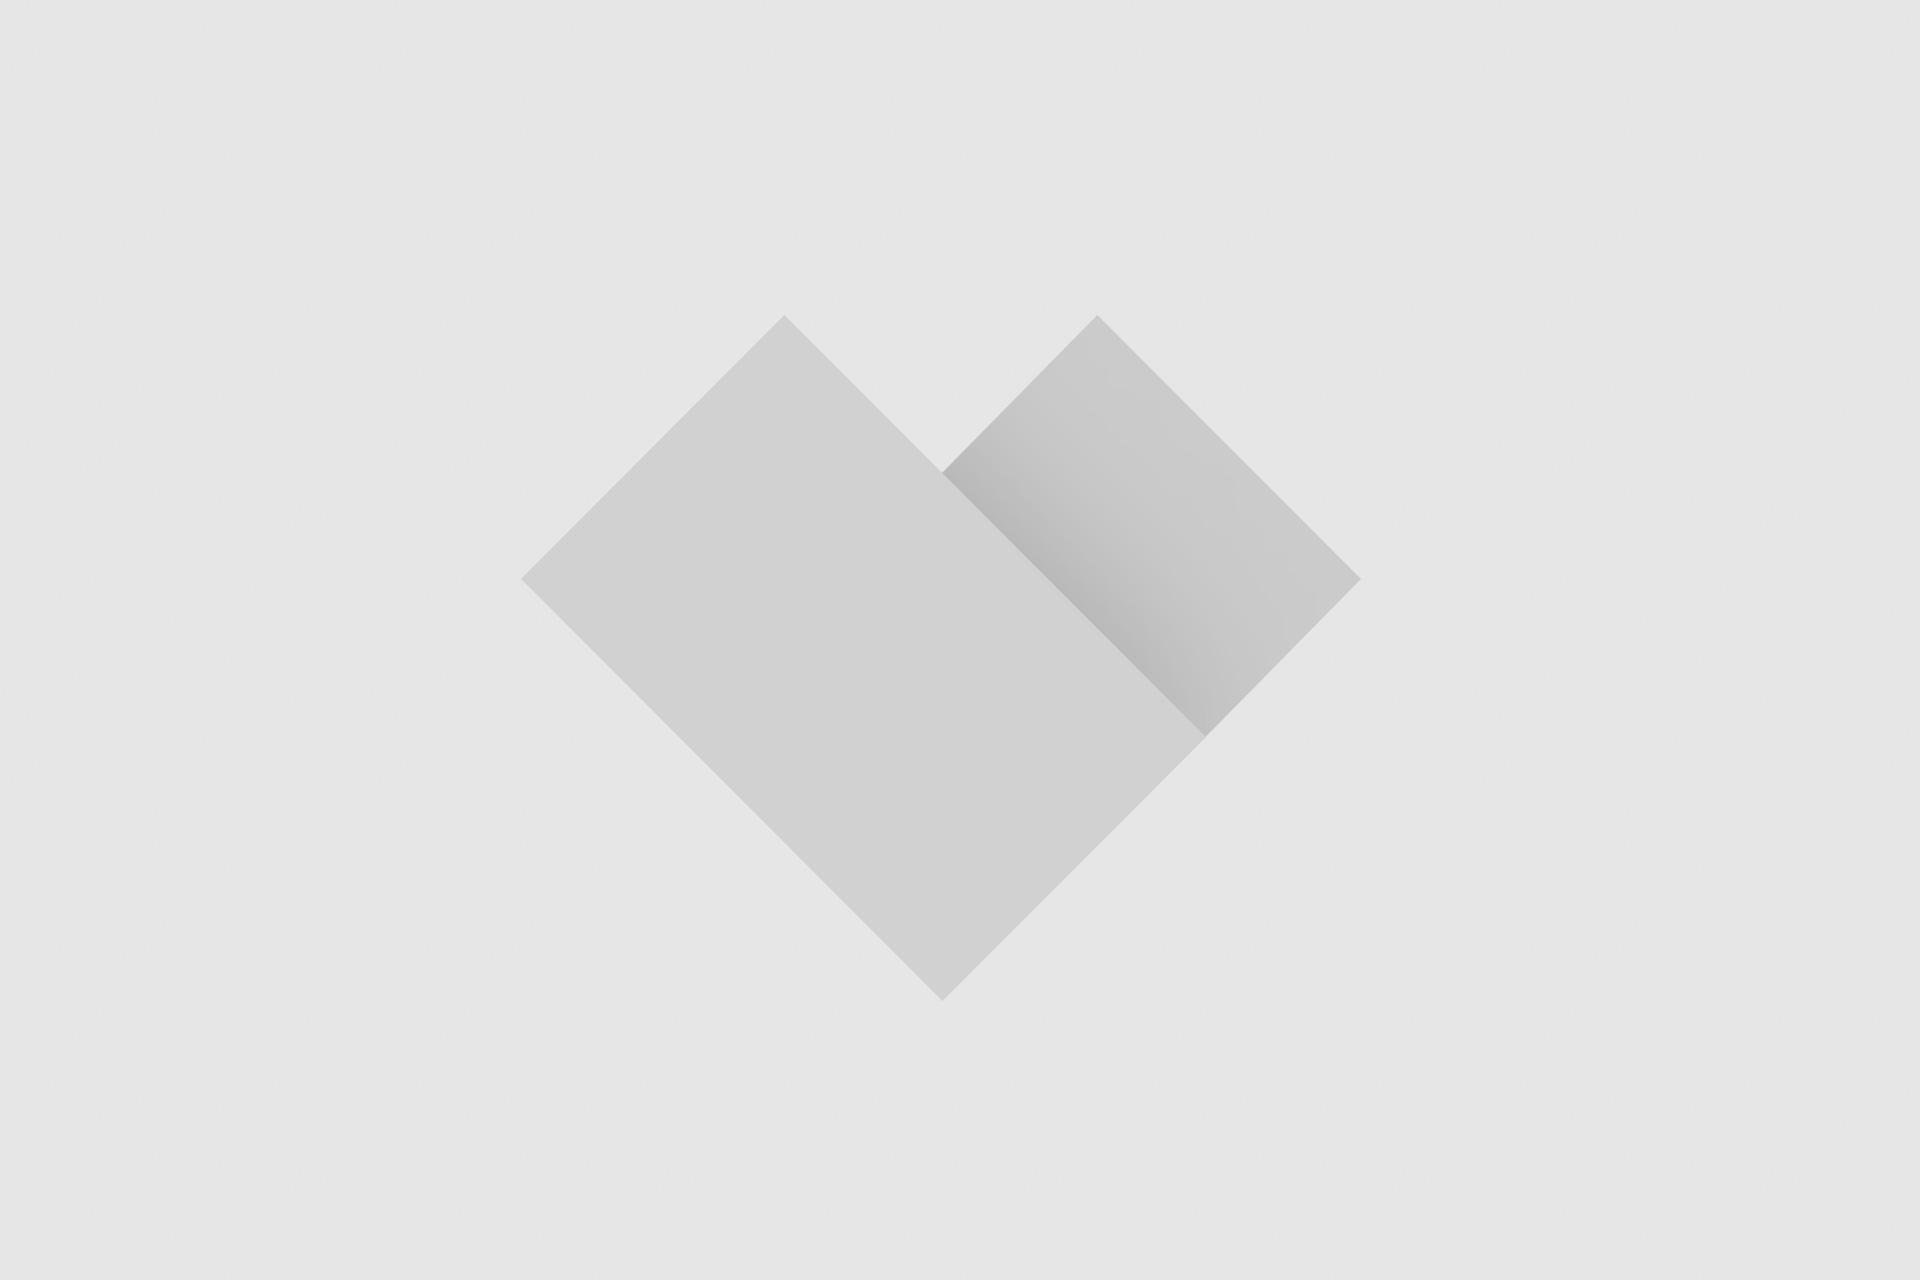 gridlove_default.jpg